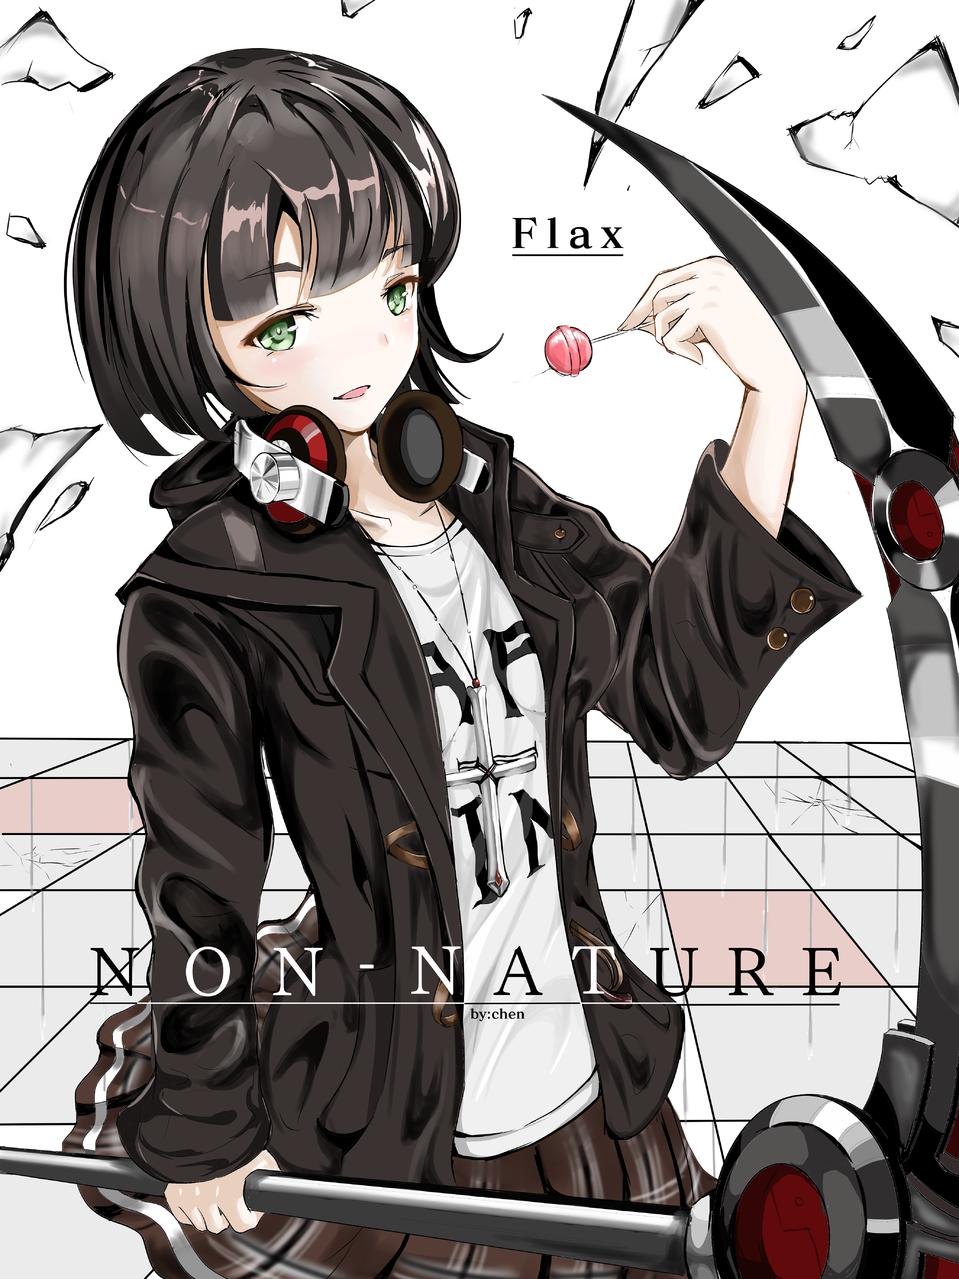 ion干员:falx